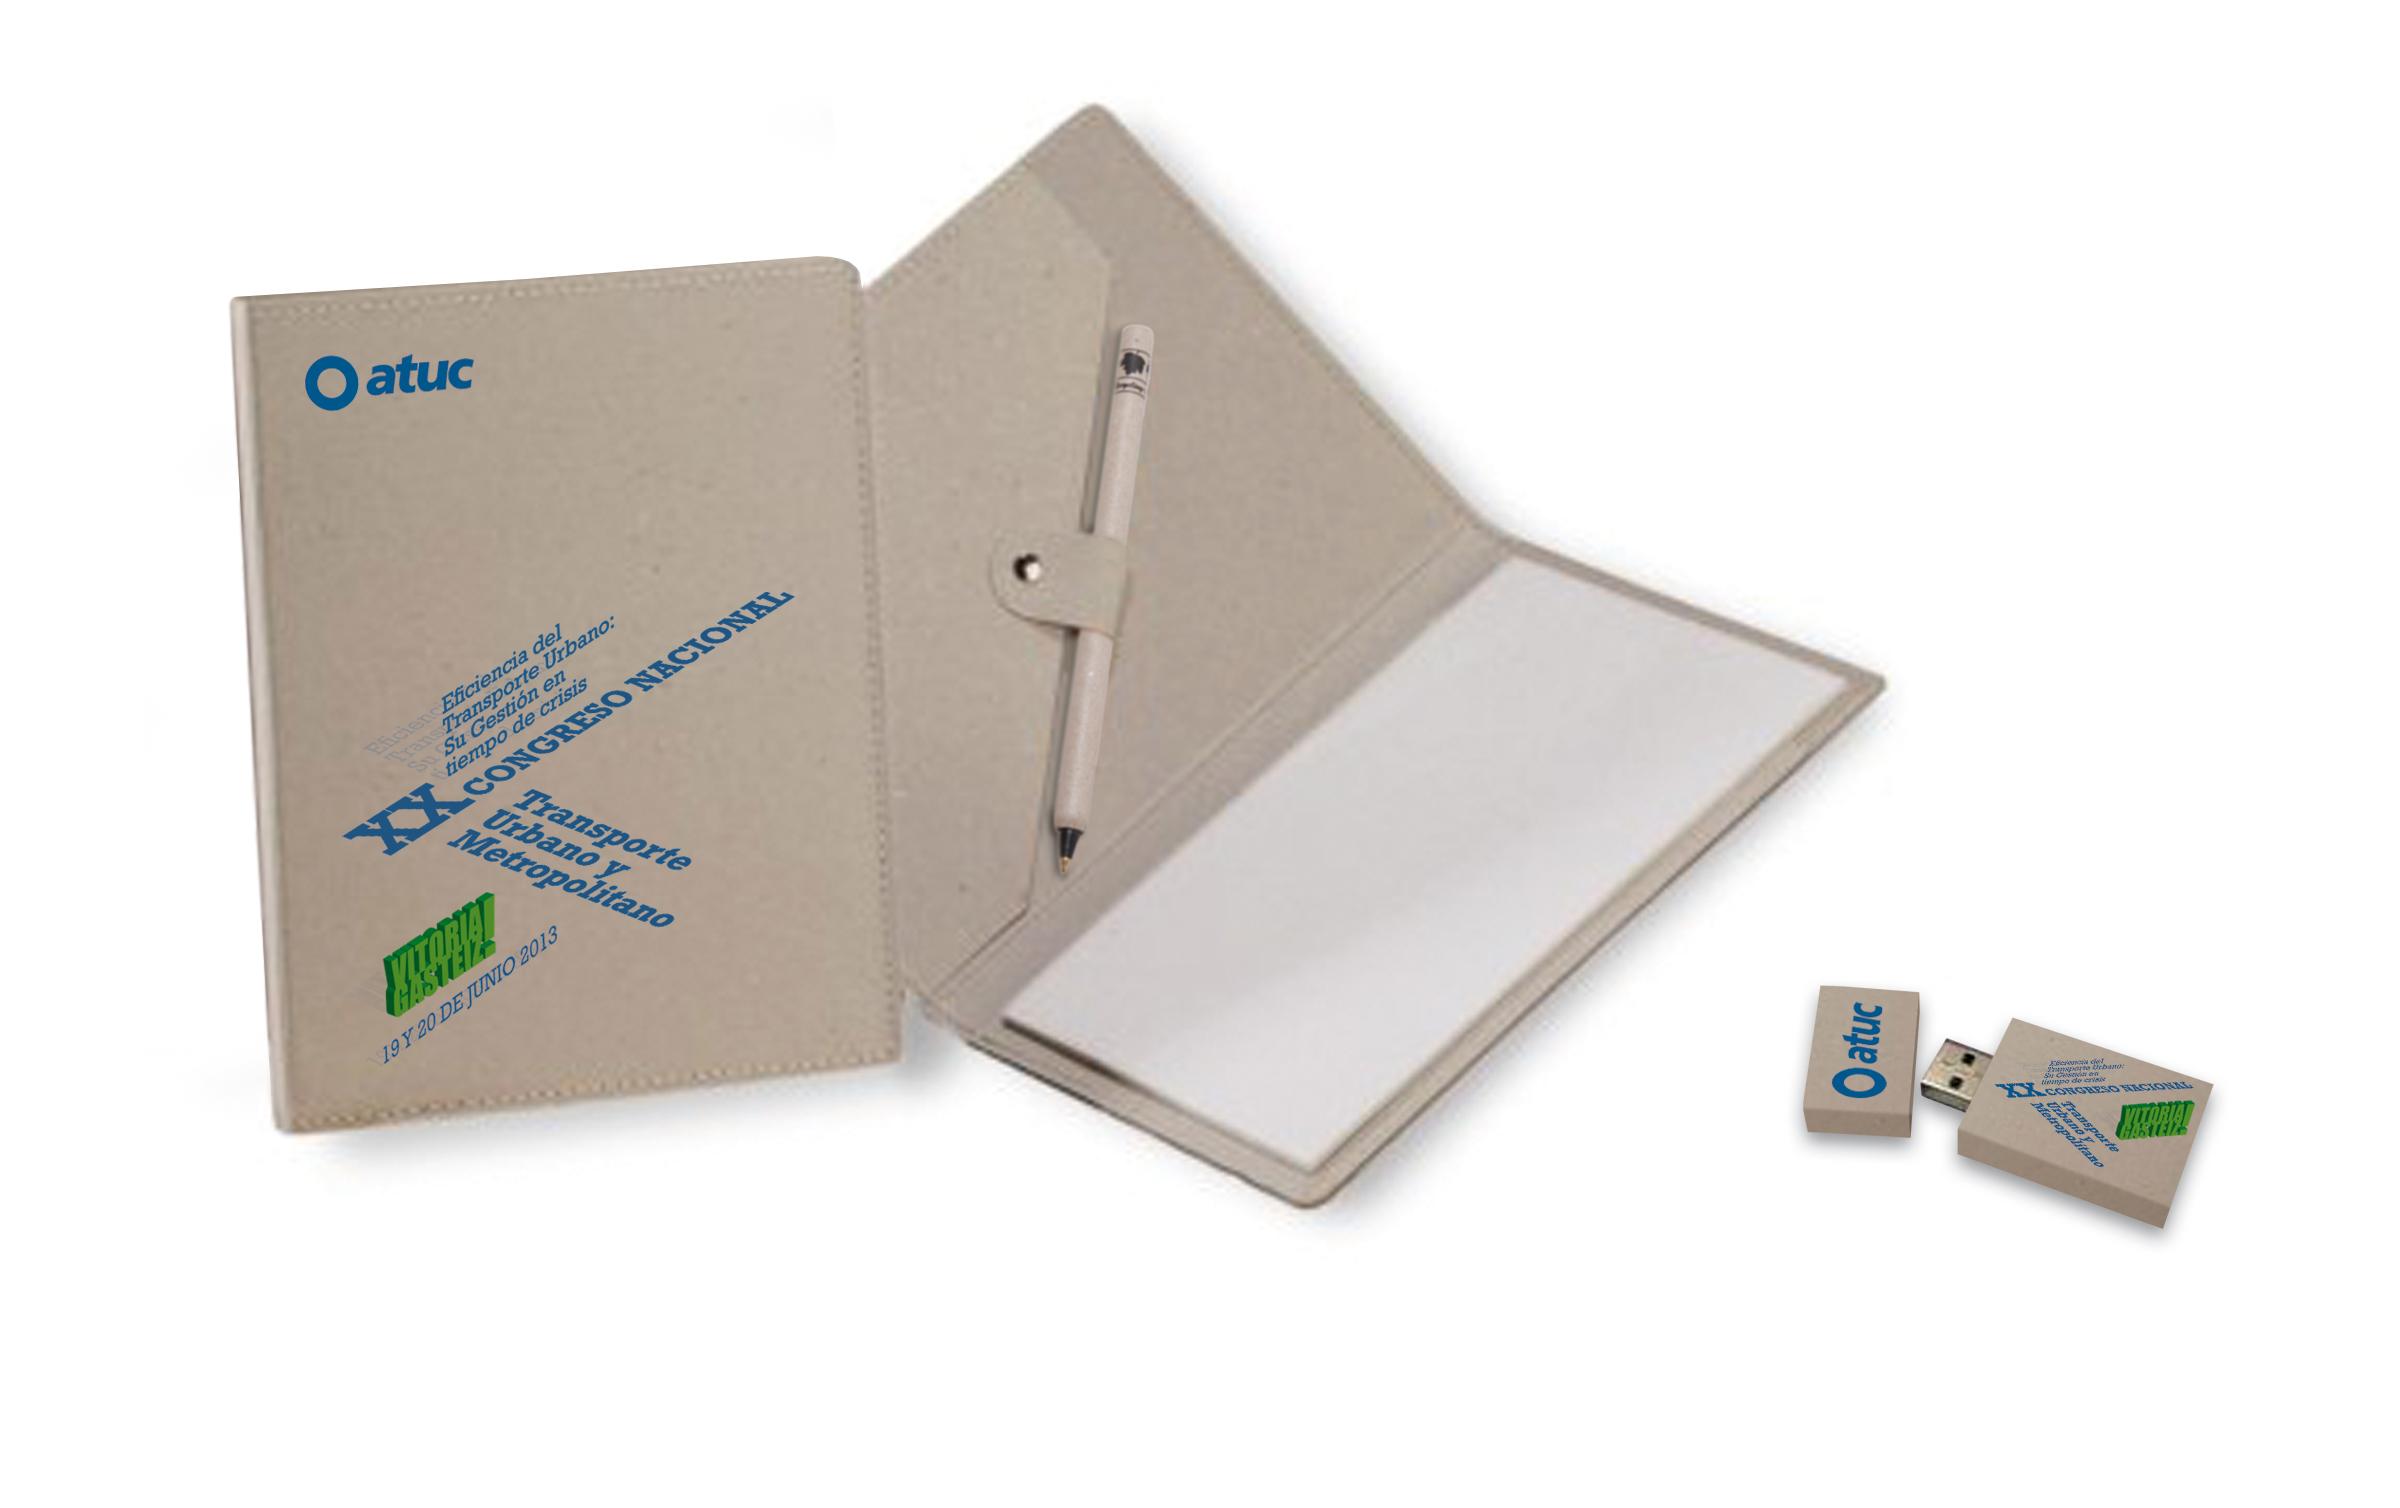 Carpeta y memoria USB para participantes